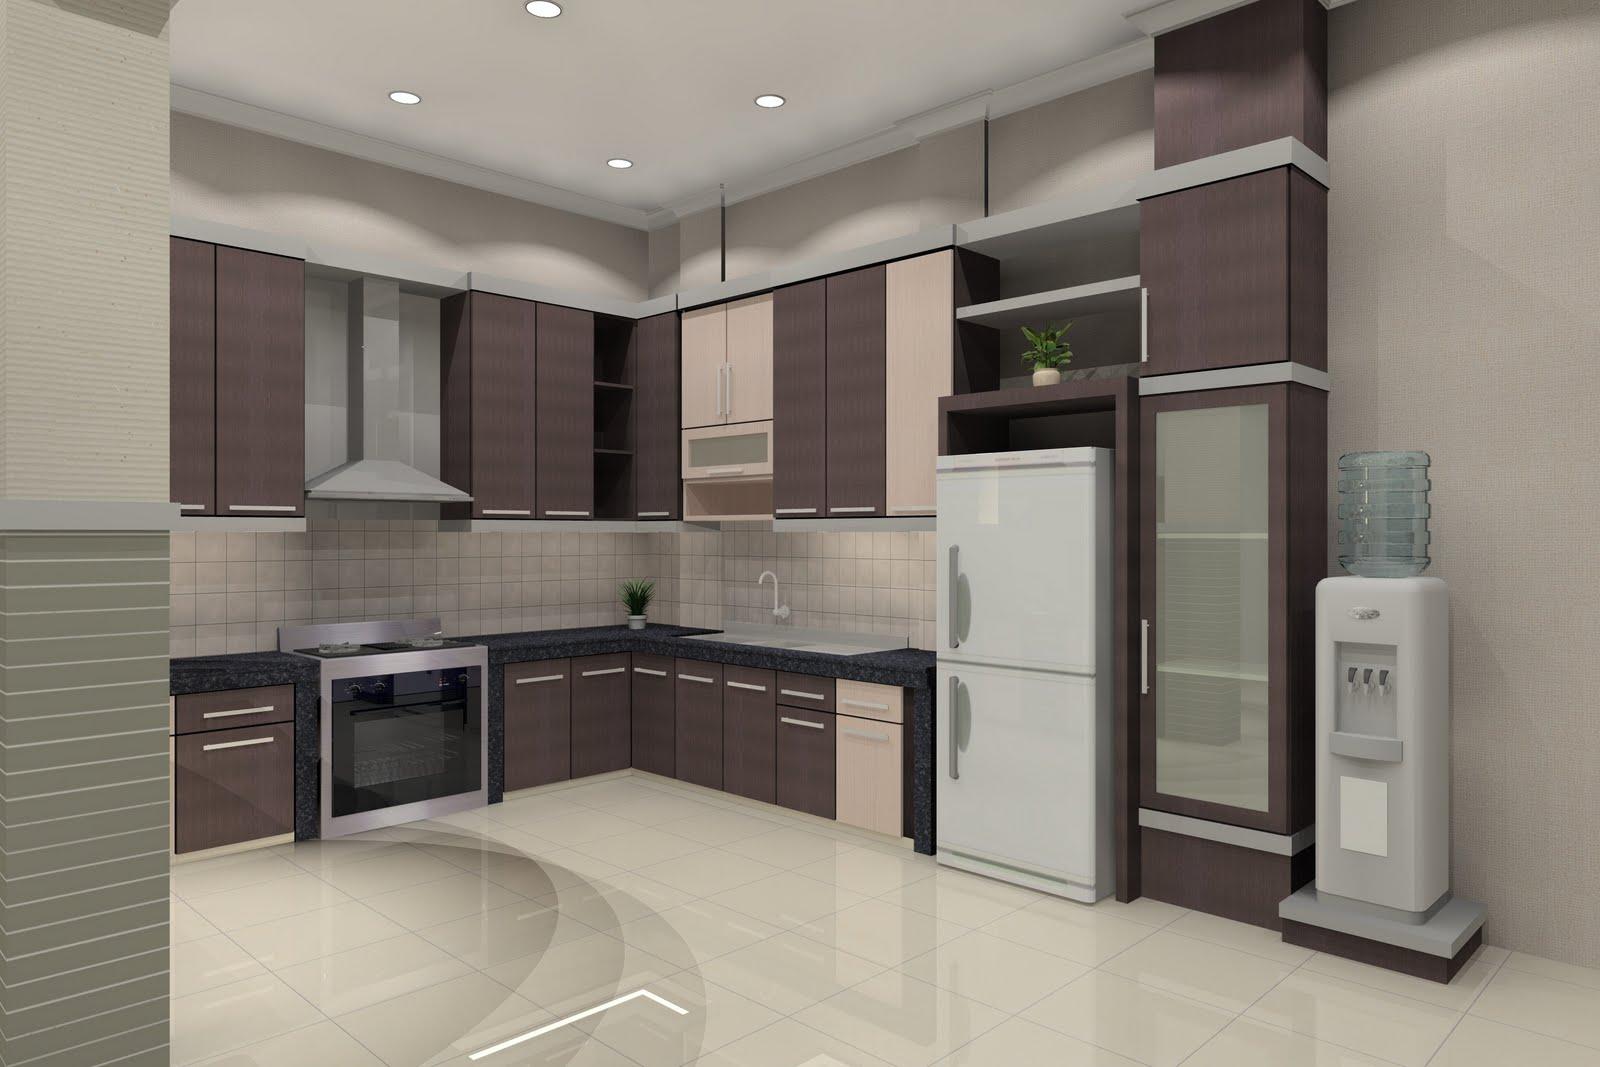 Gambar+Rumah+ +Dapur+Minimalis+Modern+3.1